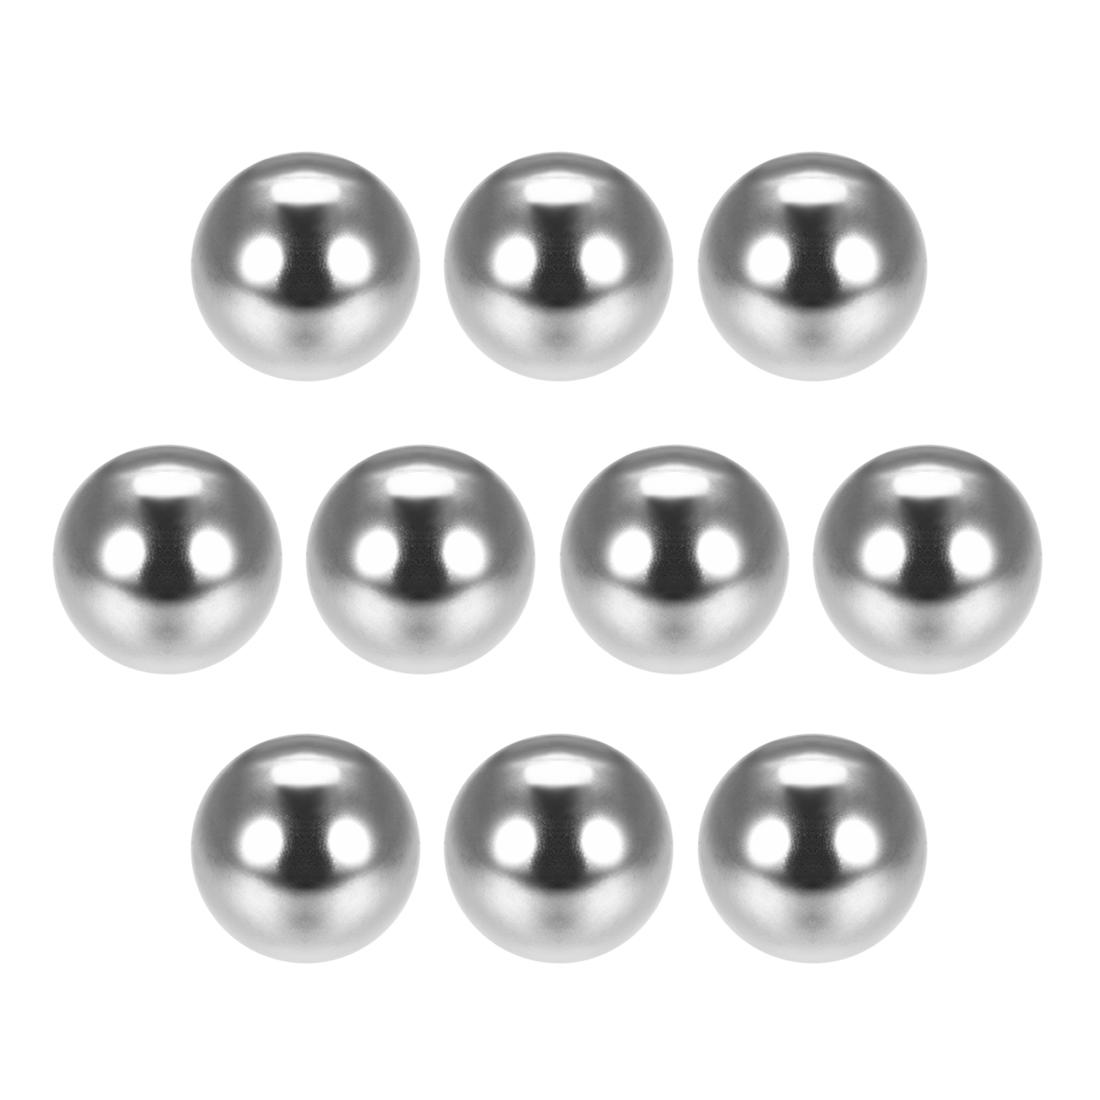 14mm Precision Chrome Steel Bearing Balls G25 10pcs